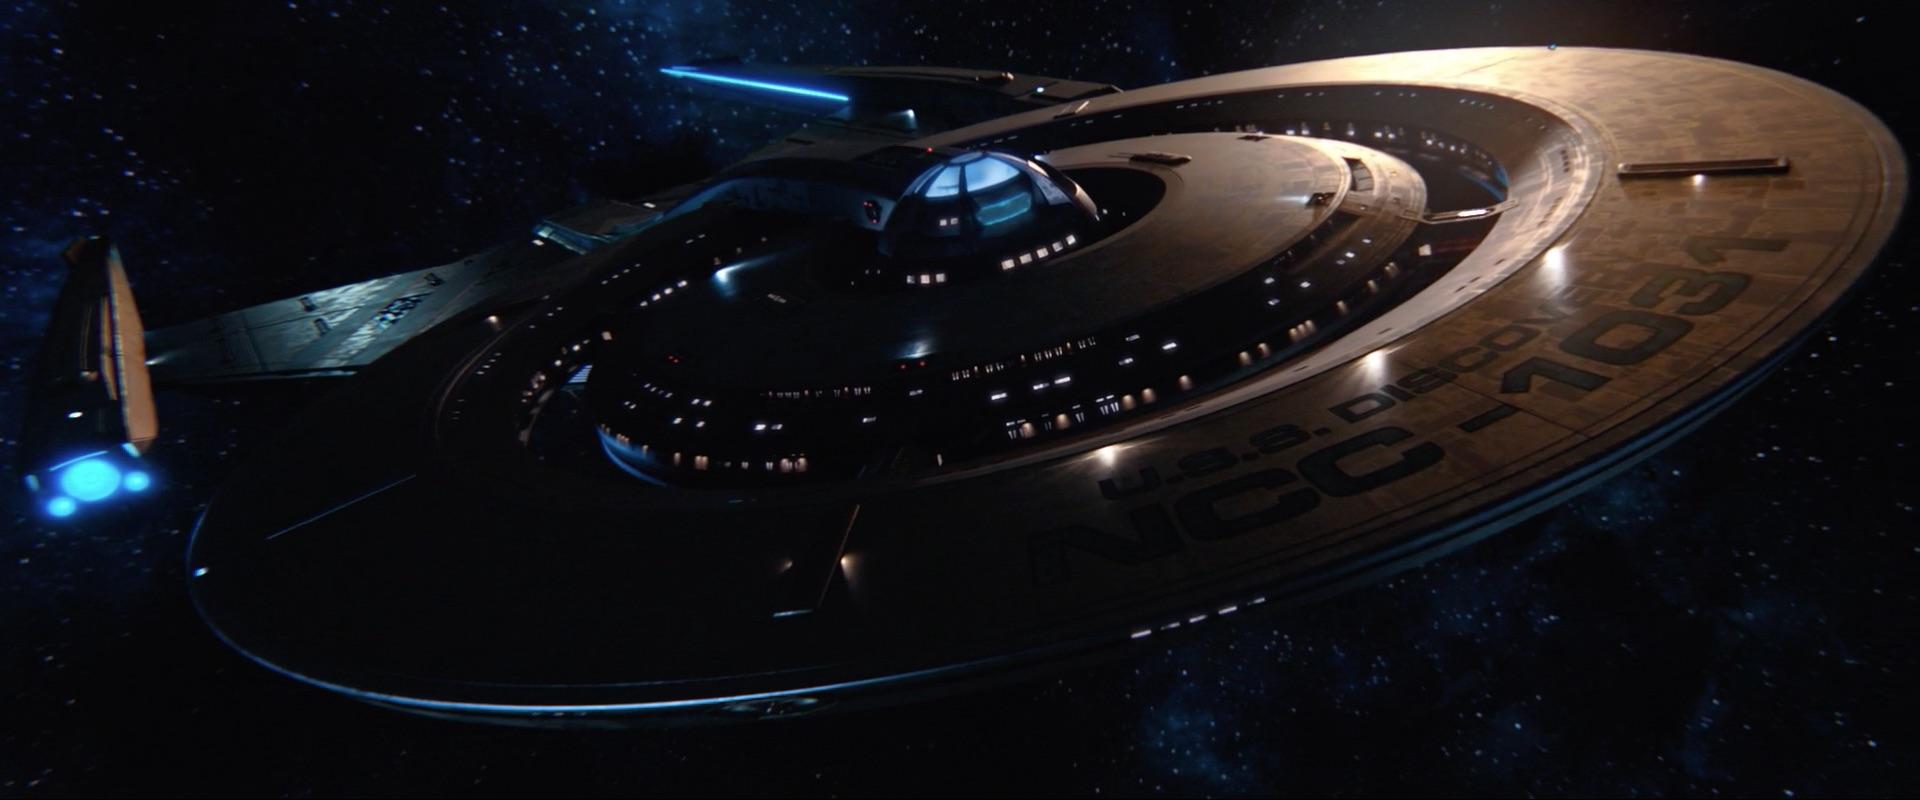 Star Trek Discovery - Neue Serie bei Netflix 2017 - Seite 16 Latest?cb=20171002161321&path-prefix=en